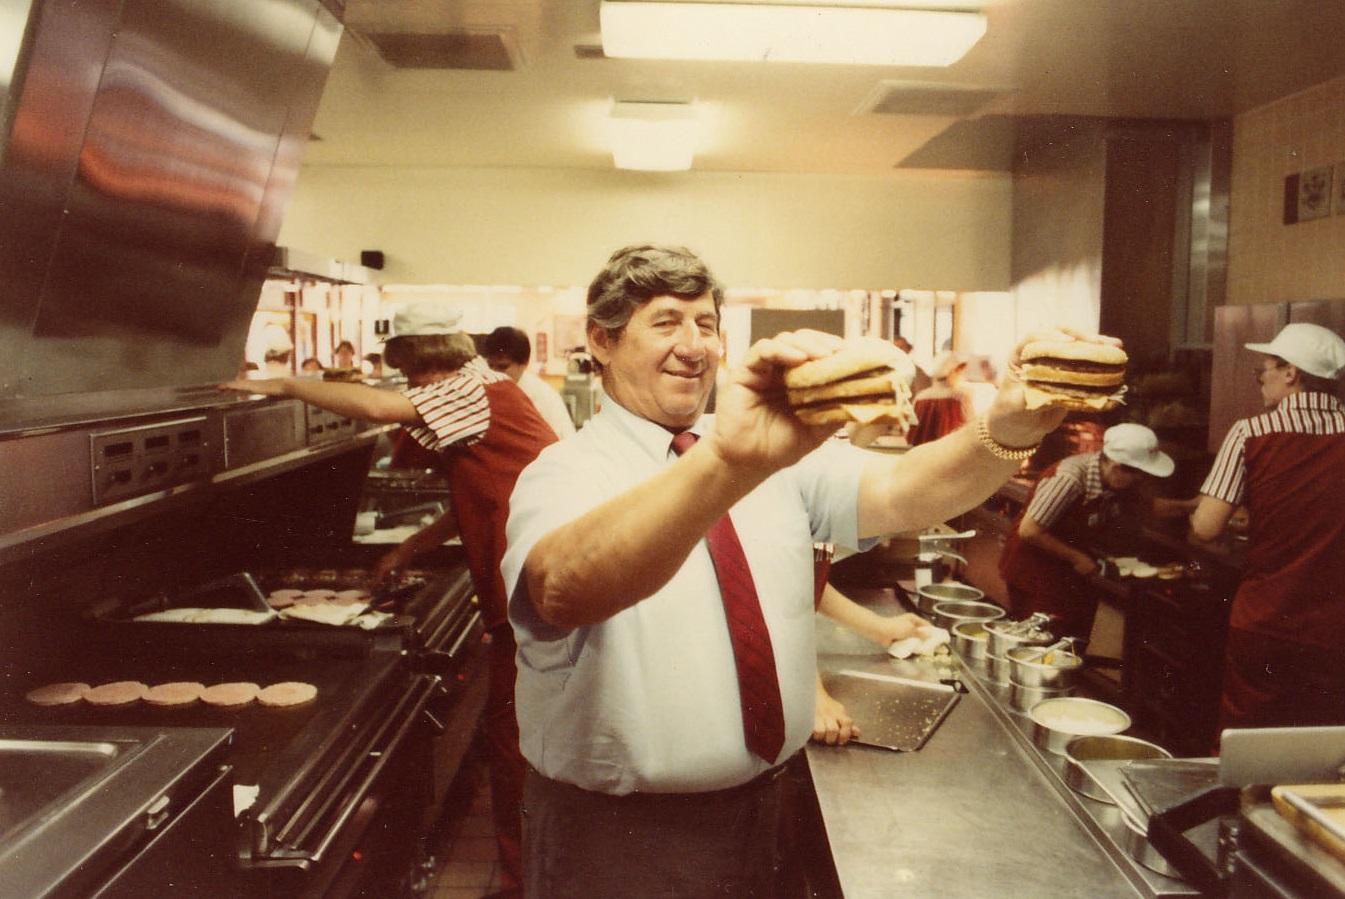 Creator Of McDonald's Big Mac Dies At 98